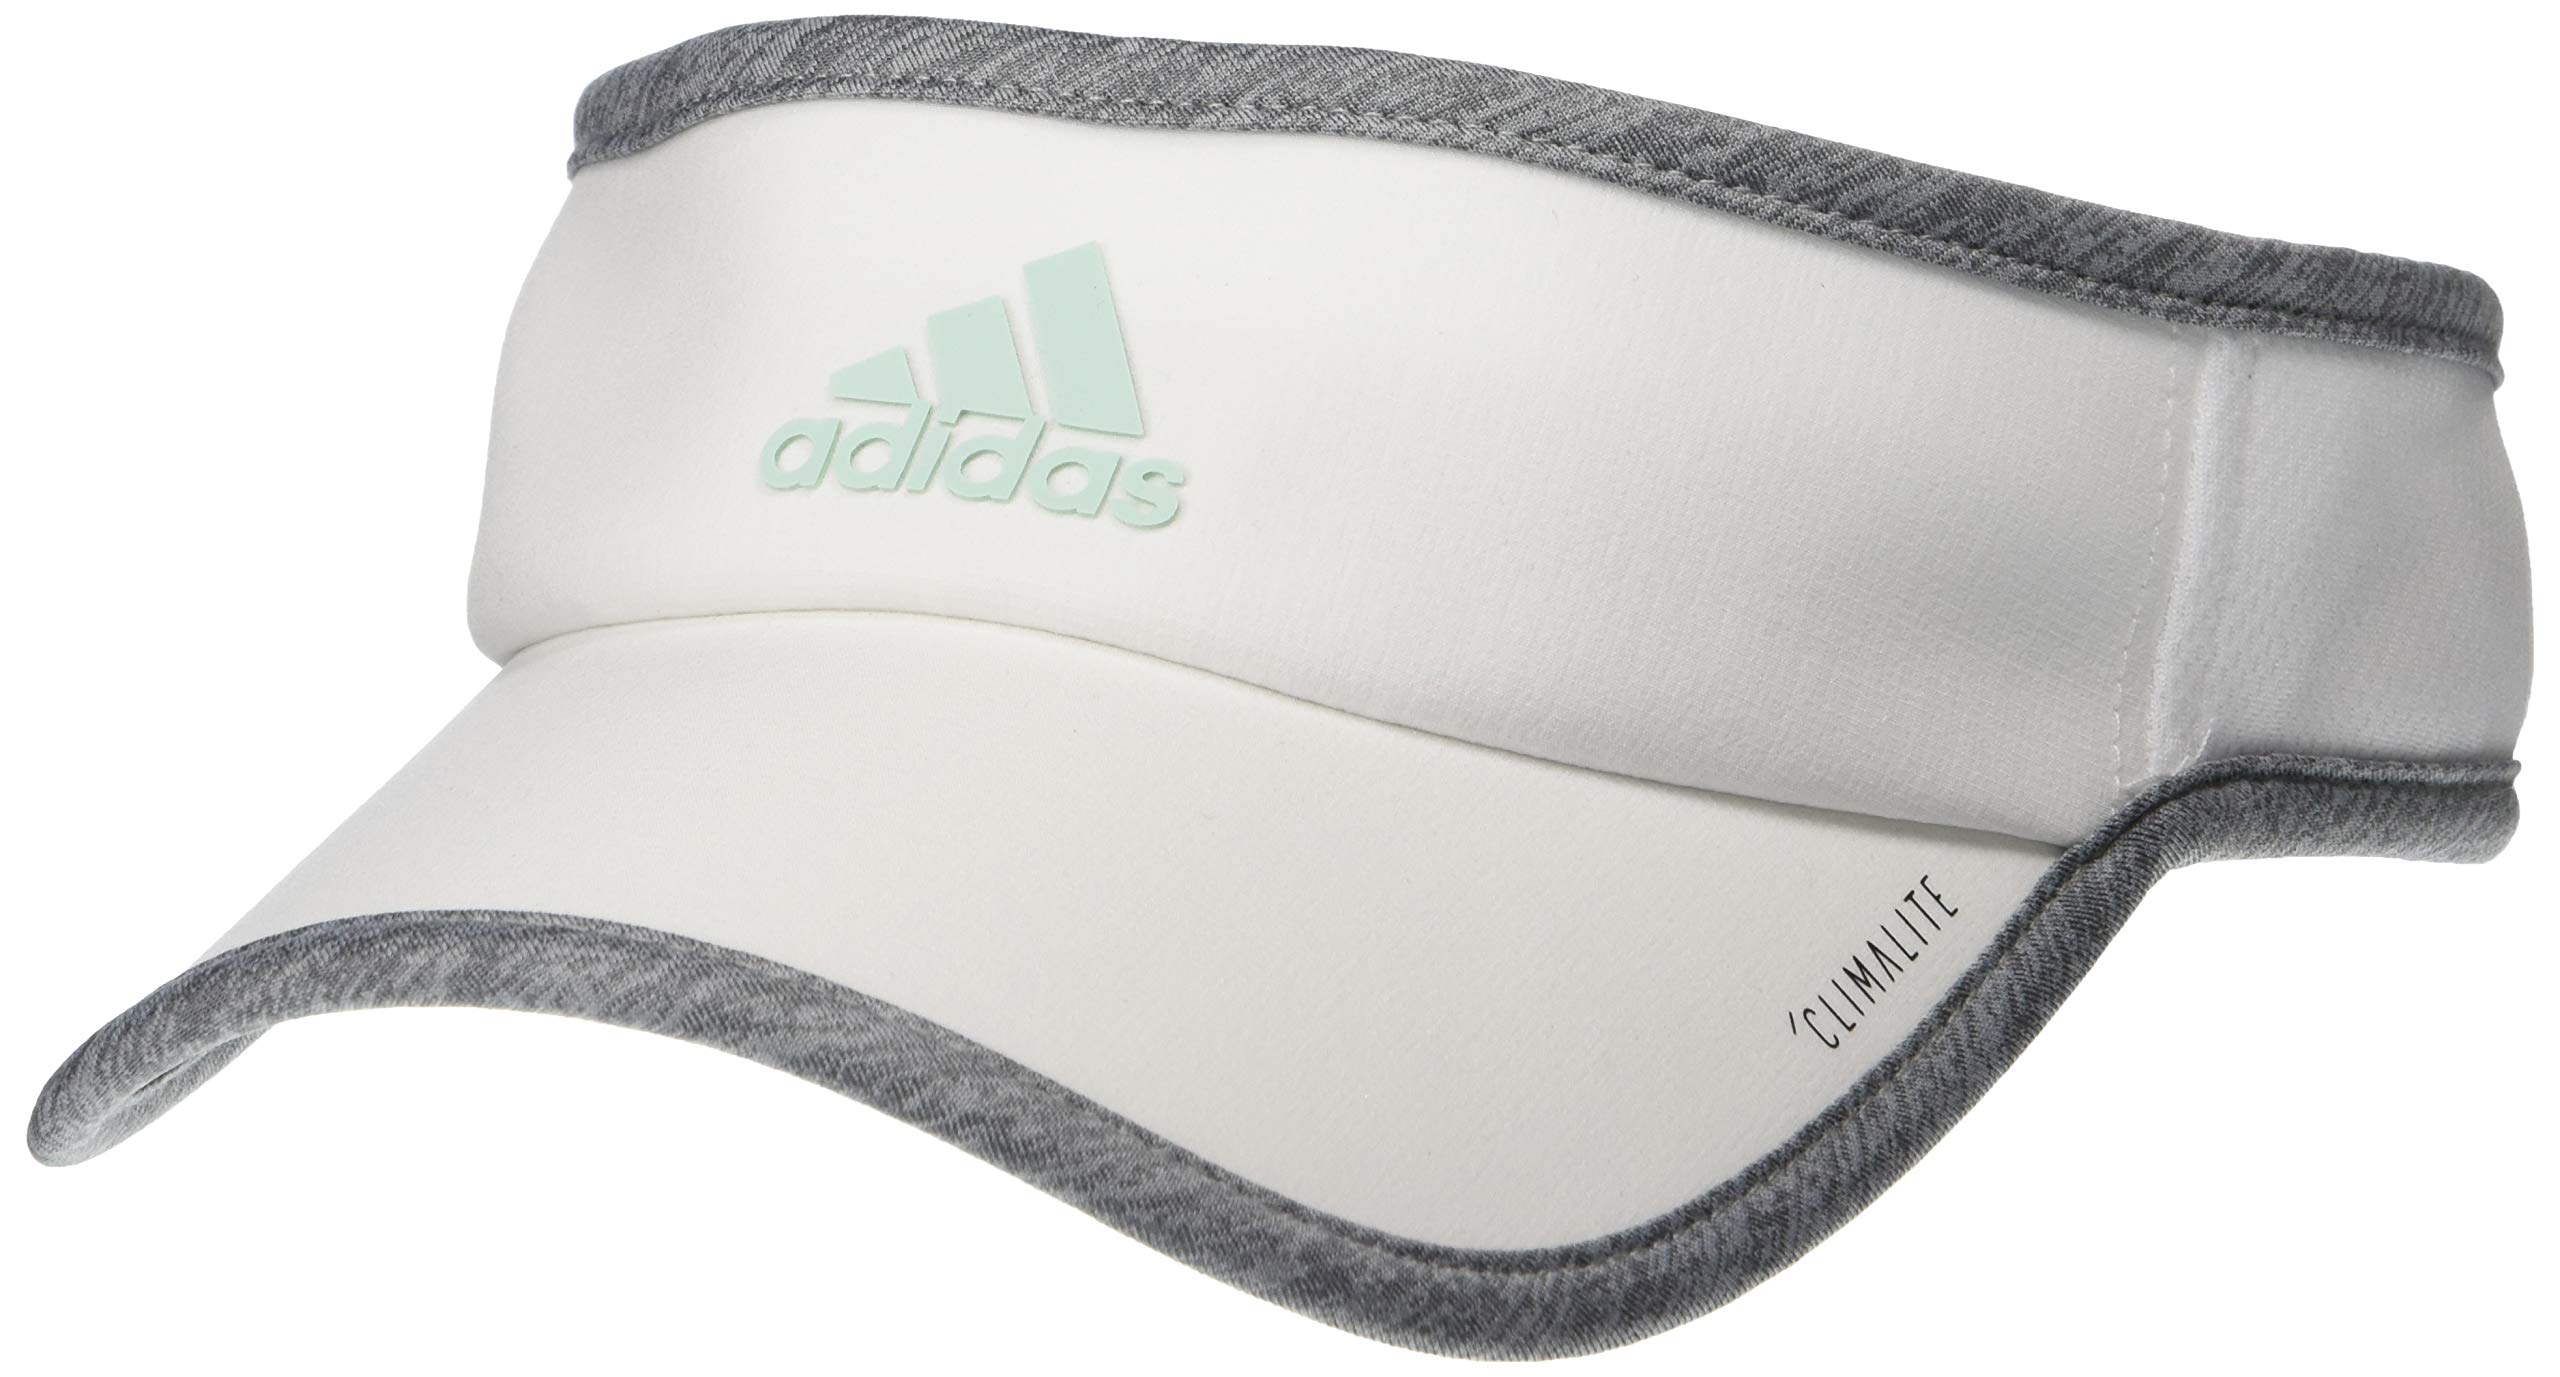 adidas Women's SuperLite Visor, White/Light Heather Grey/Clear Mint, One Size